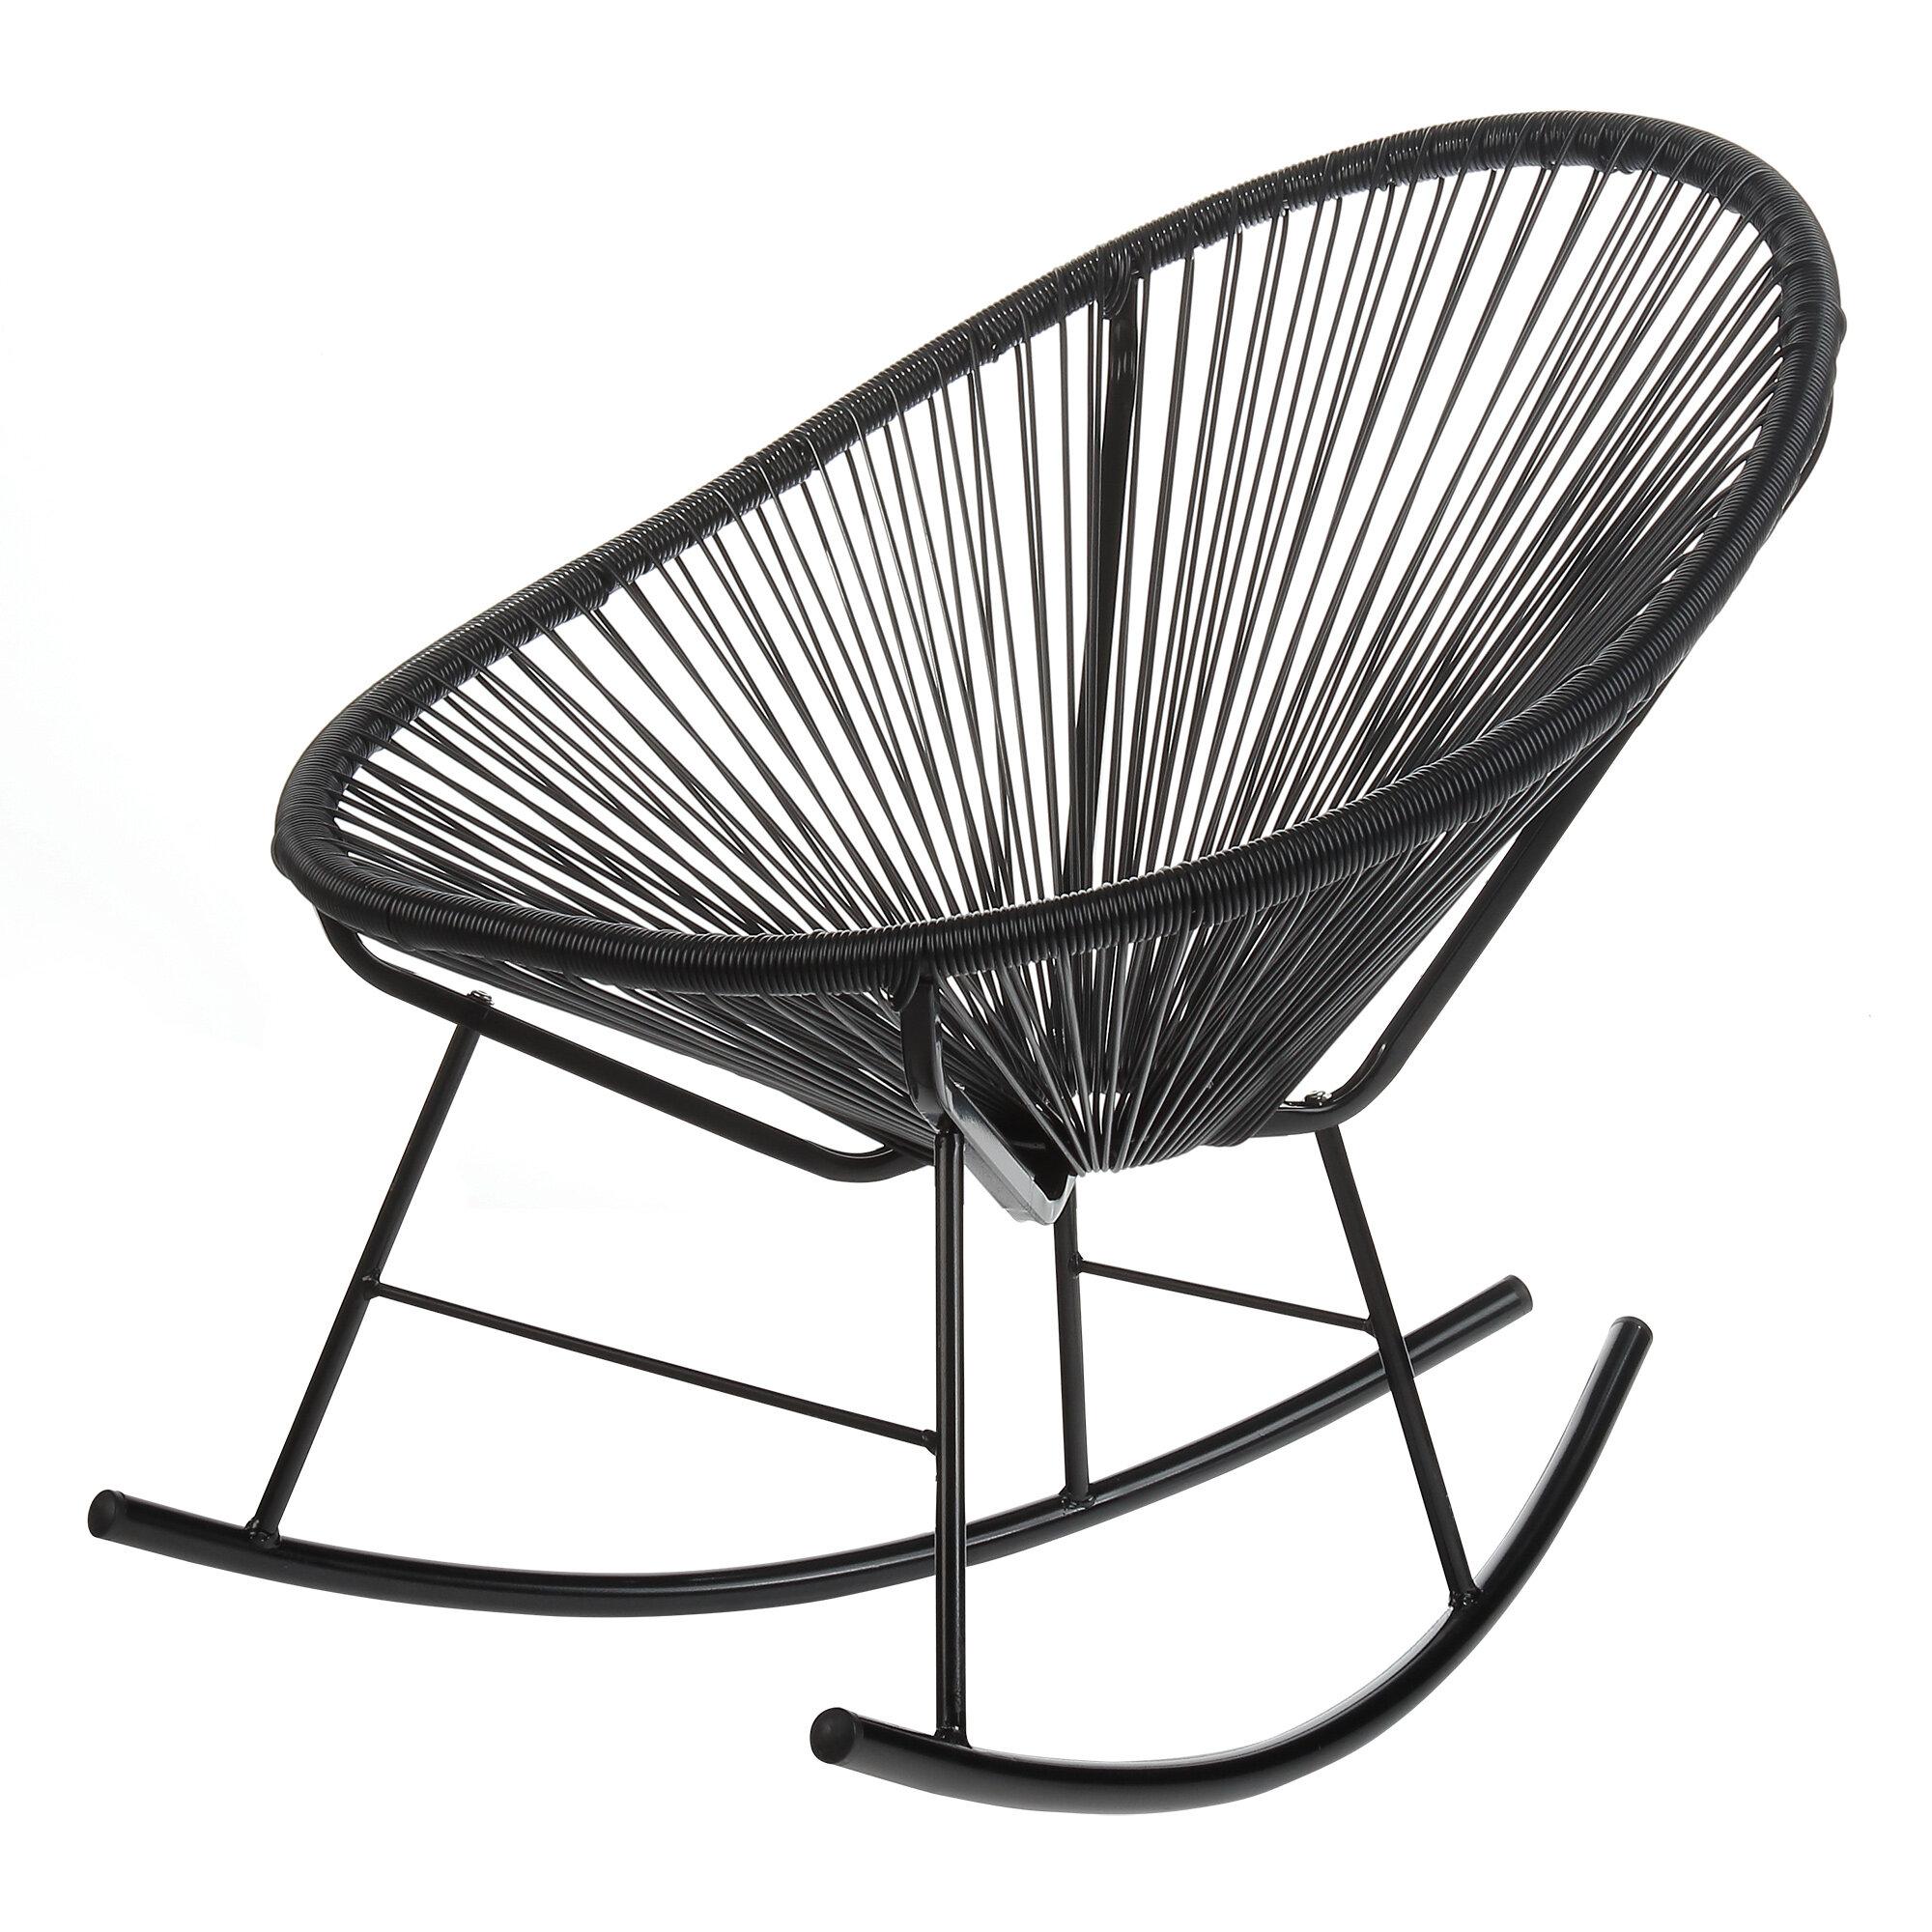 Rocking chair drawing Sketch Allmodern Design Tree Home Acapulco Rocking Chair Reviews Allmodern